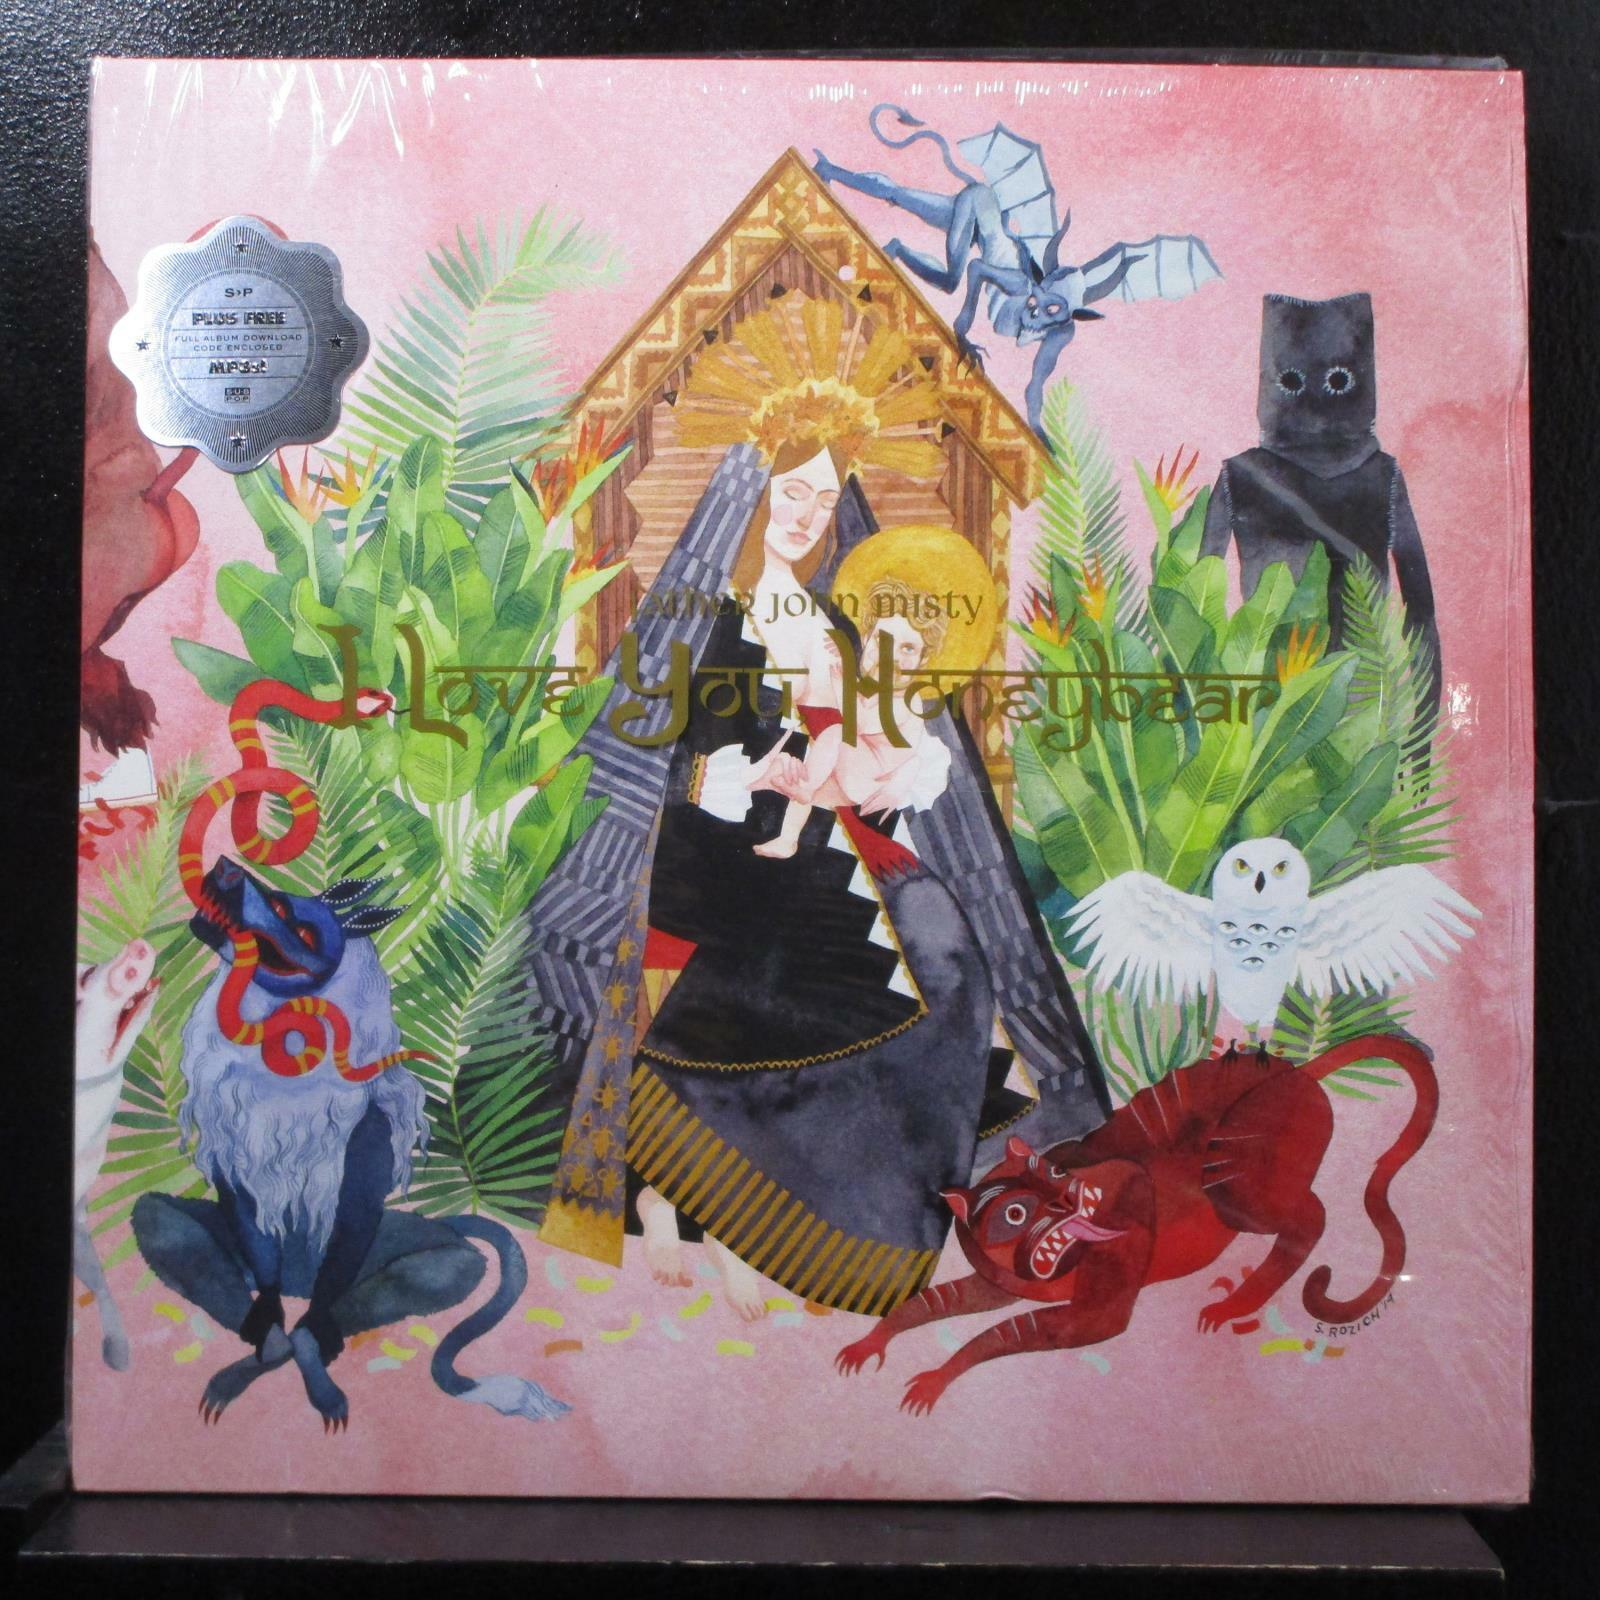 Father John Misty - I Love You, Honeybear 2 LP 45 RPM New SP1115 Clear Vinyl